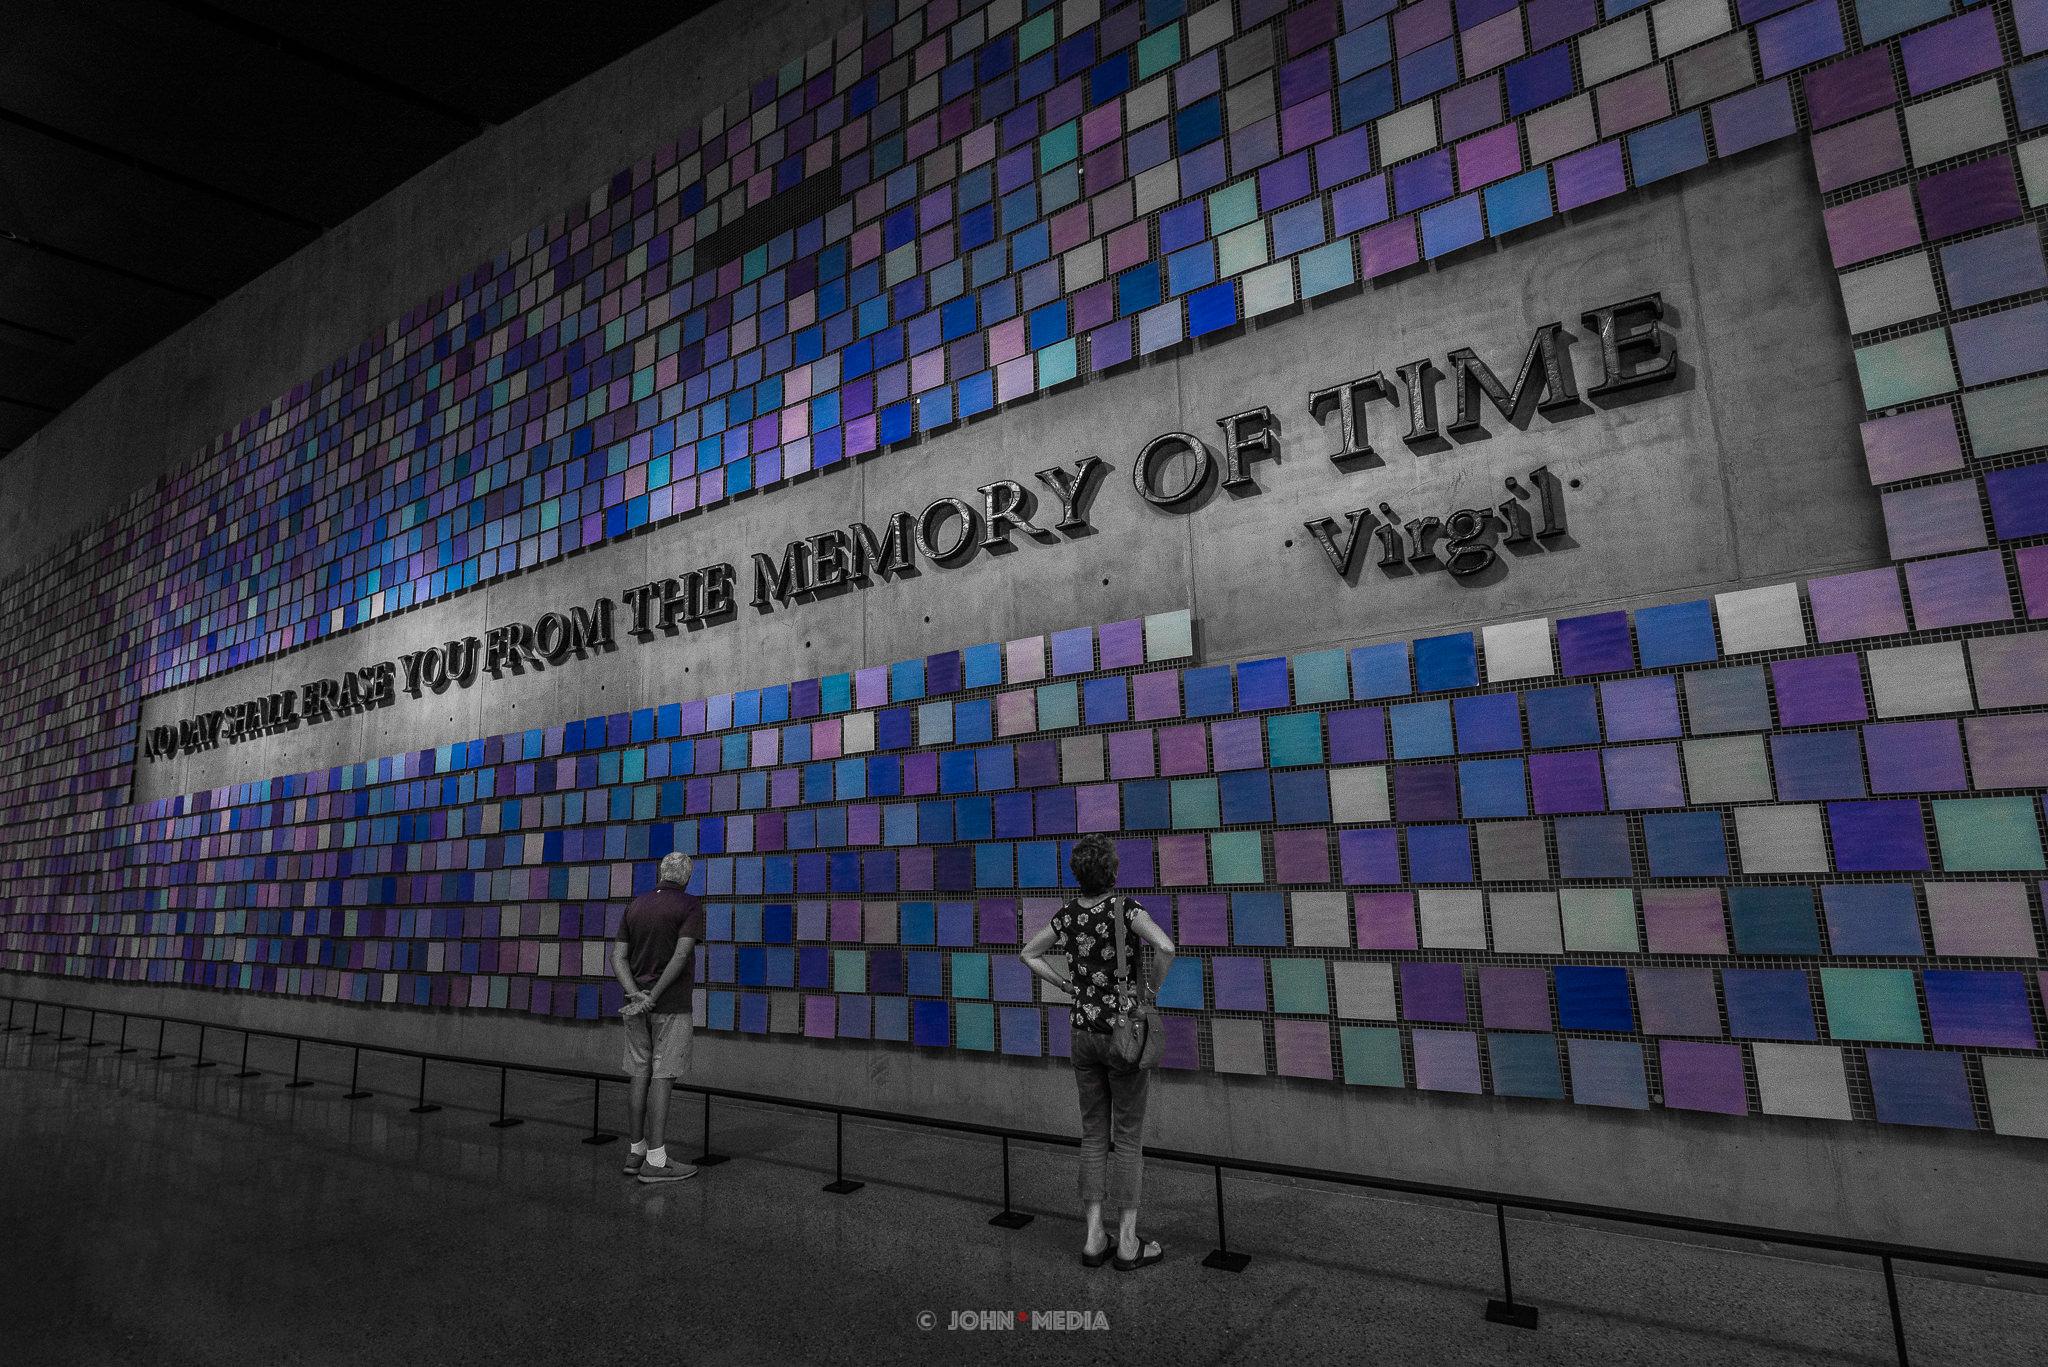 9/11 Memorial - Contemplation